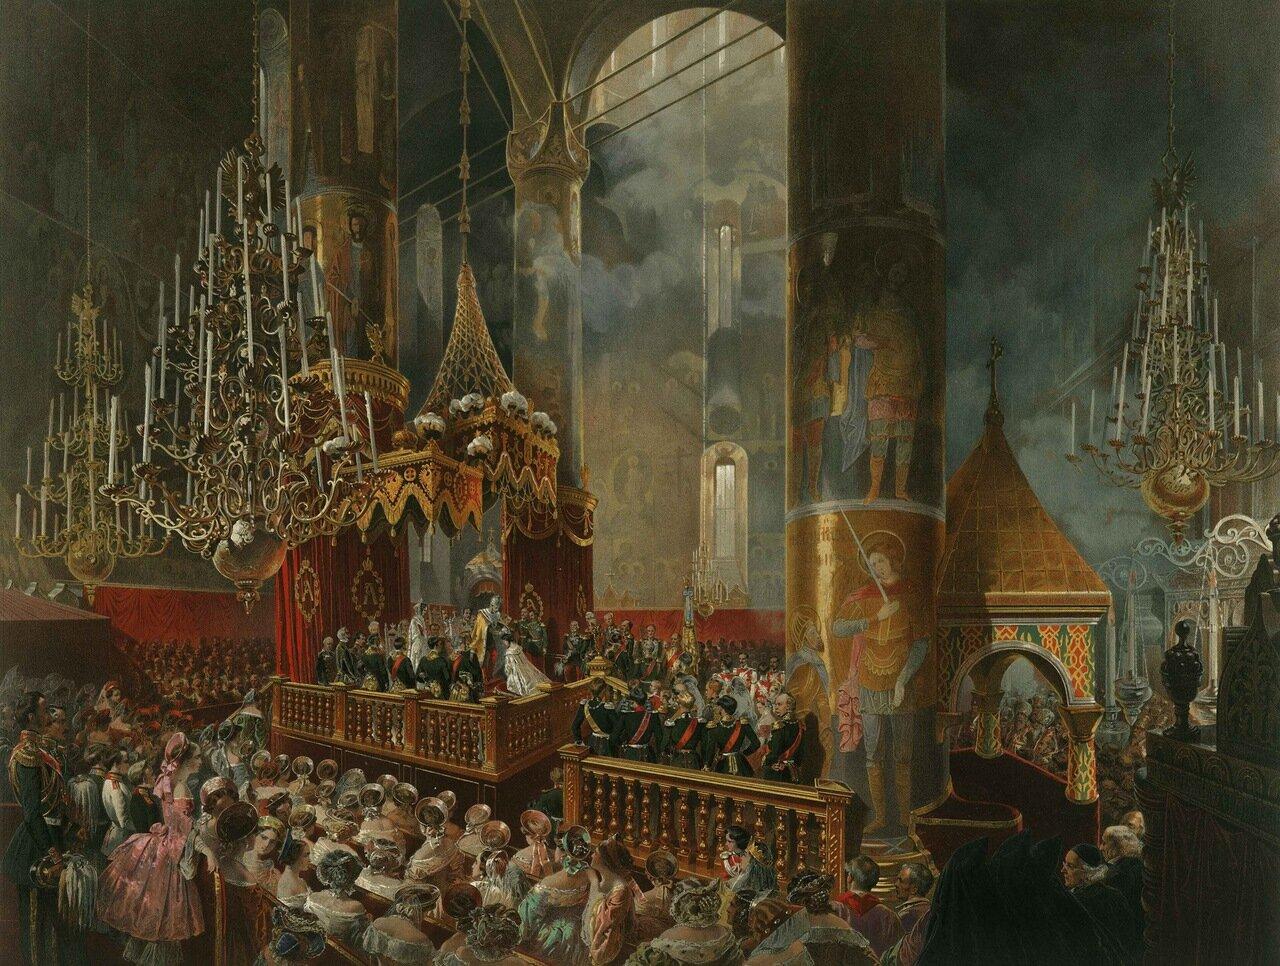 Сцена коронации Александра II в Успенском соборе 26 августа 1856.